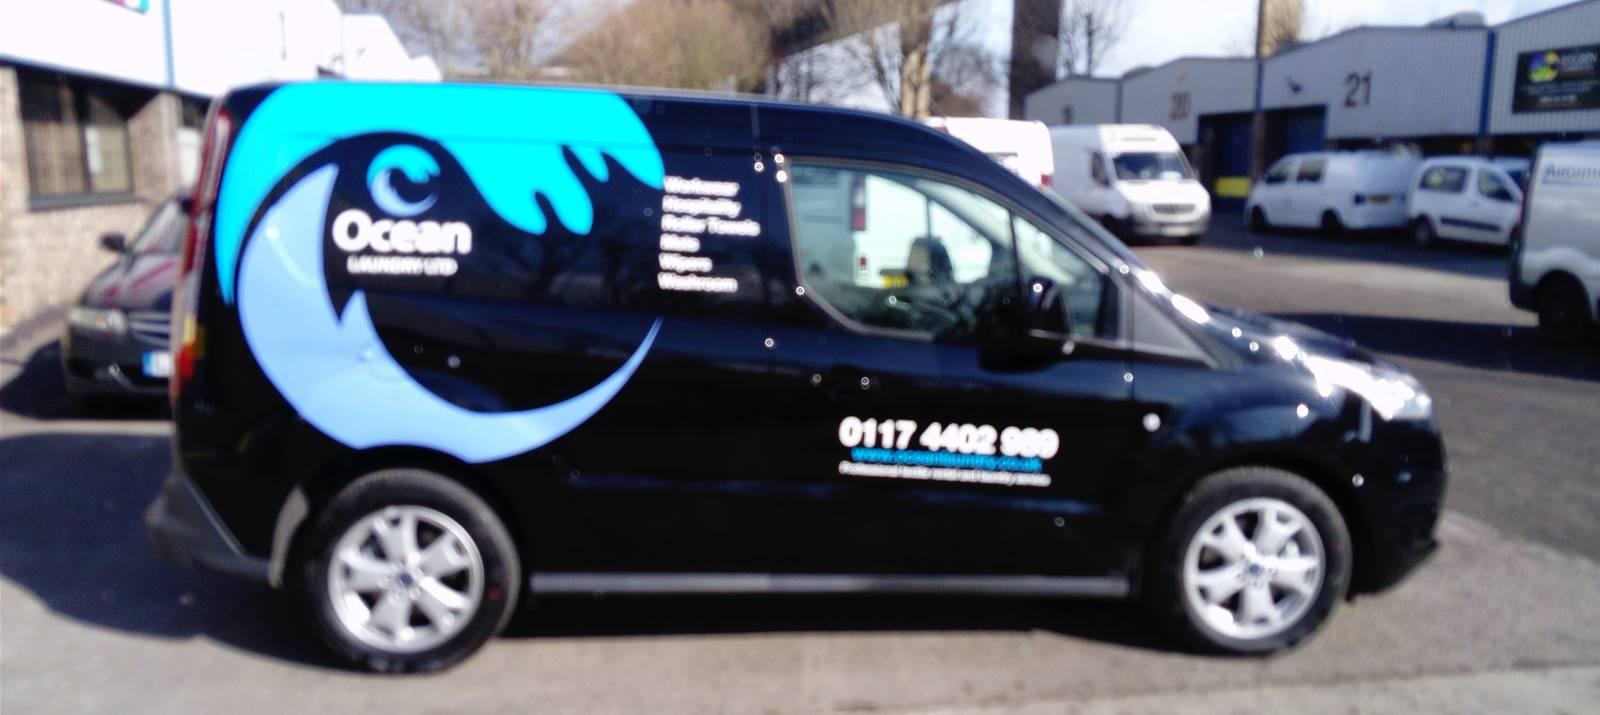 Partial van wrap with vehicle graphics in Bristol